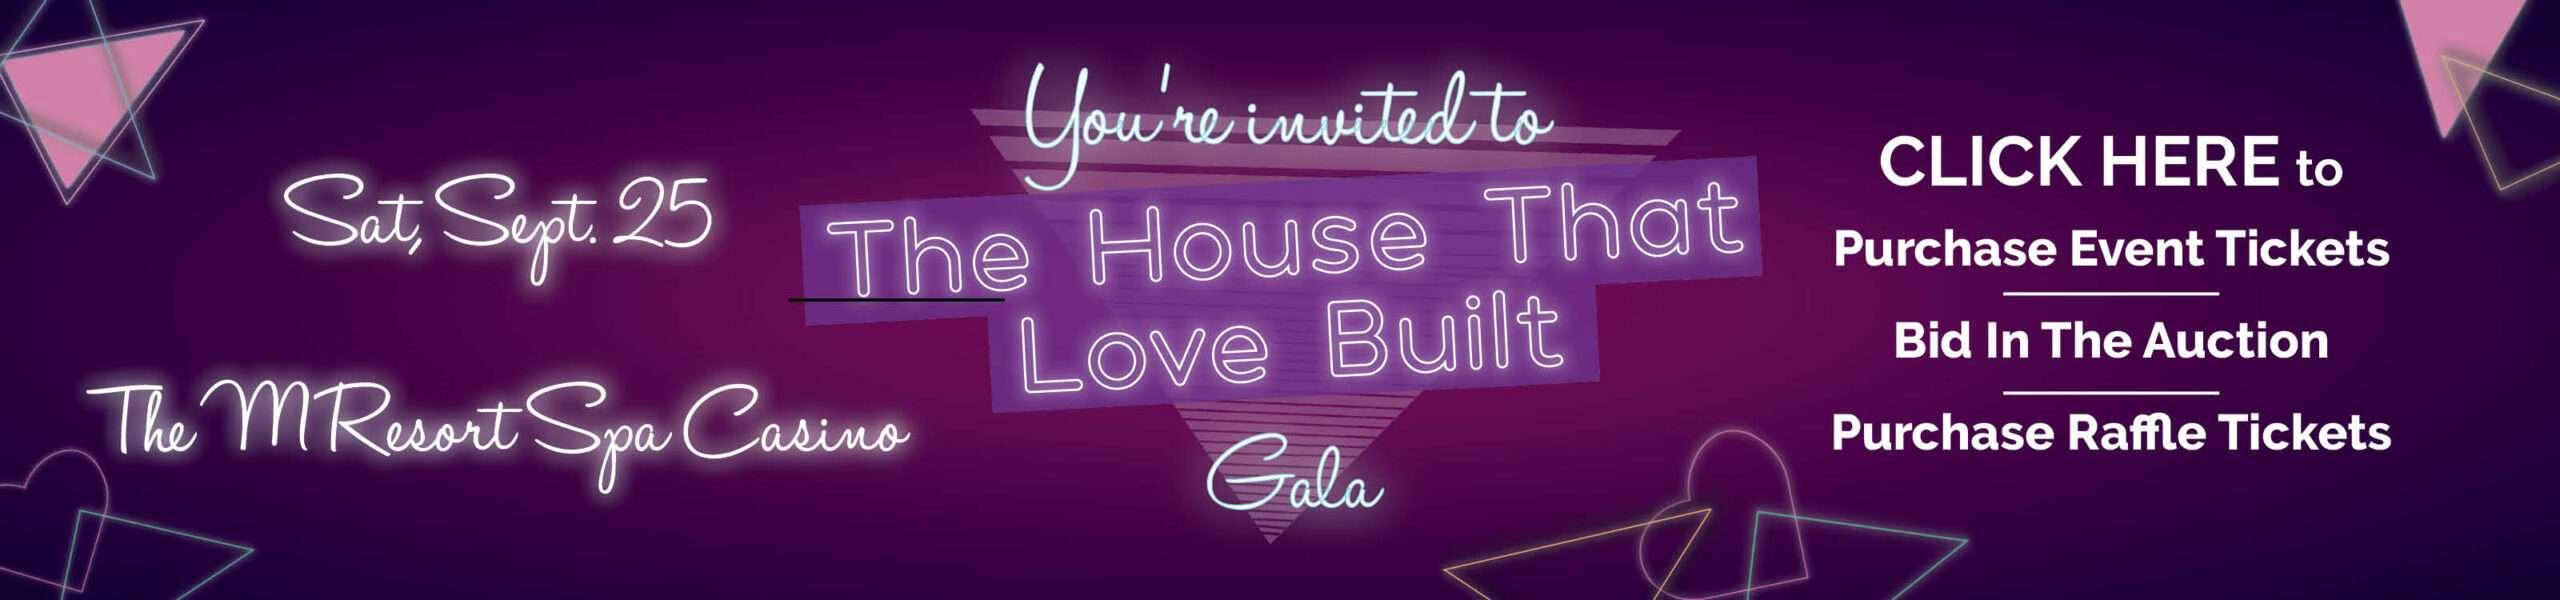 Gala Web Banner v2